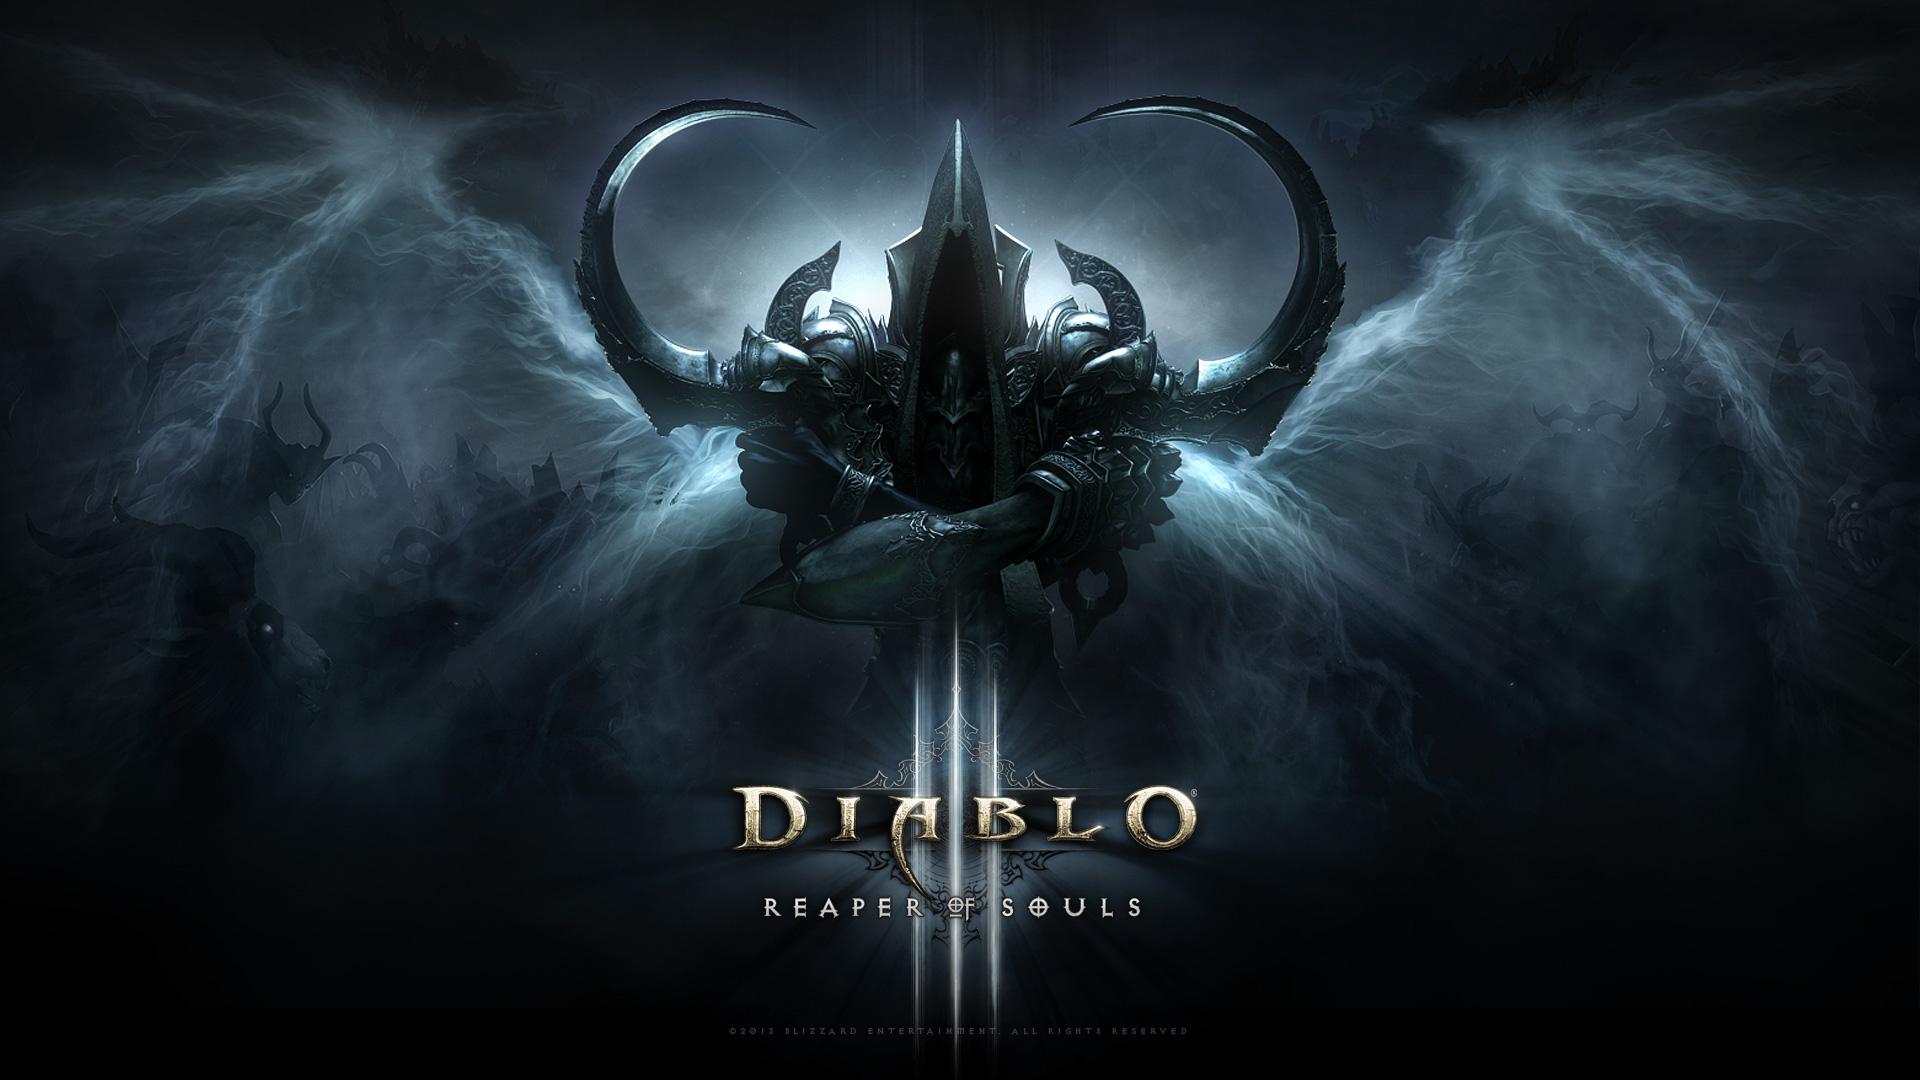 Арт к игре Diablo 3: Reaper of Souls